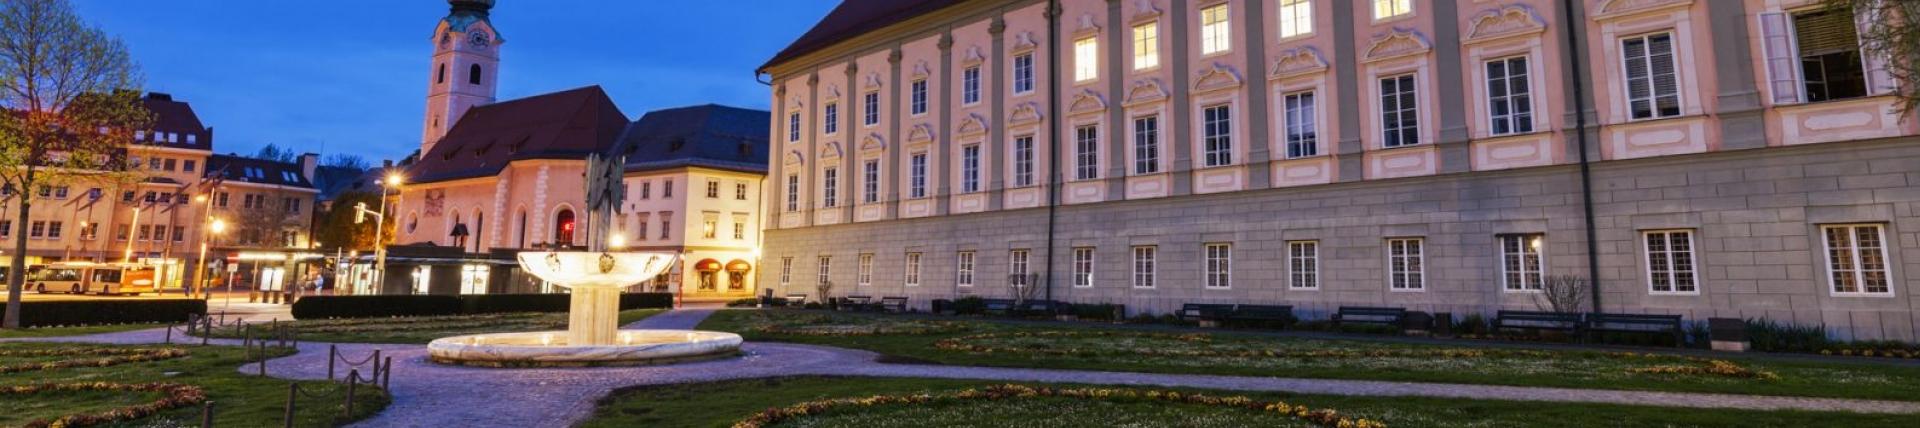 Top coworking spaces in klagenfurt austria